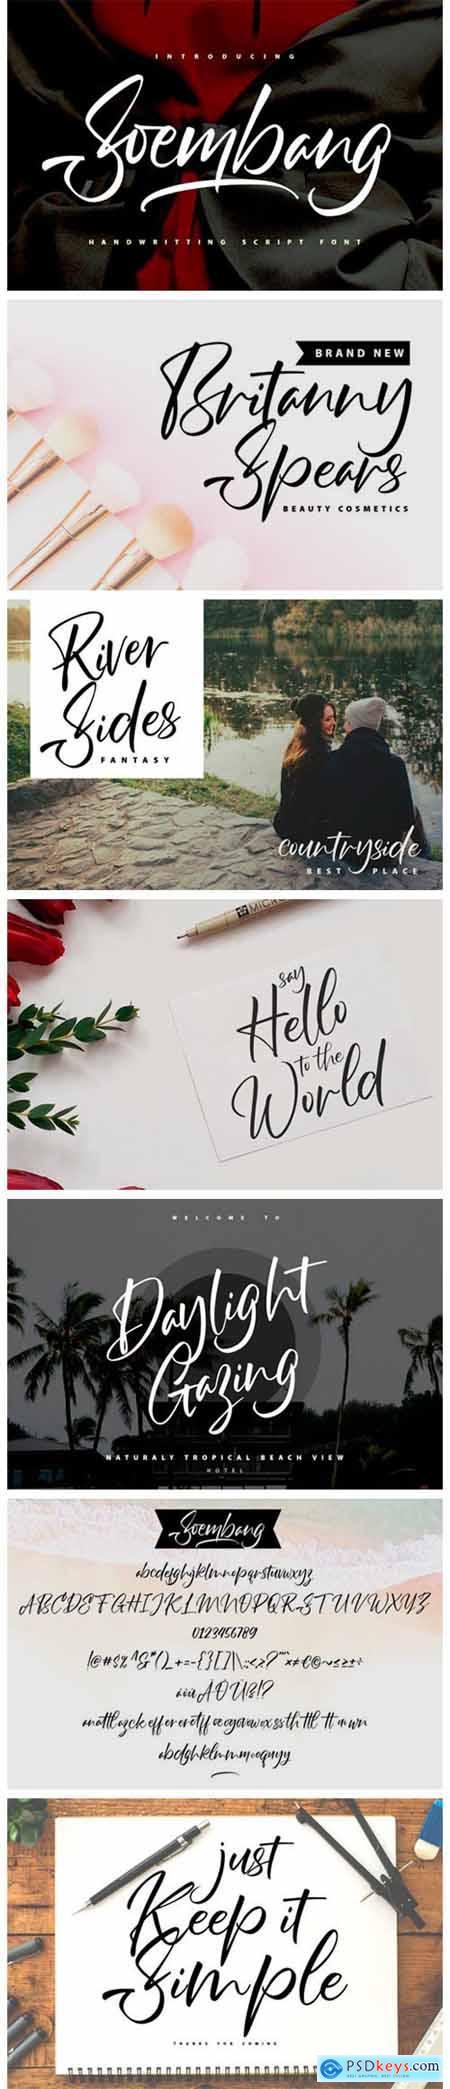 Soembang Font